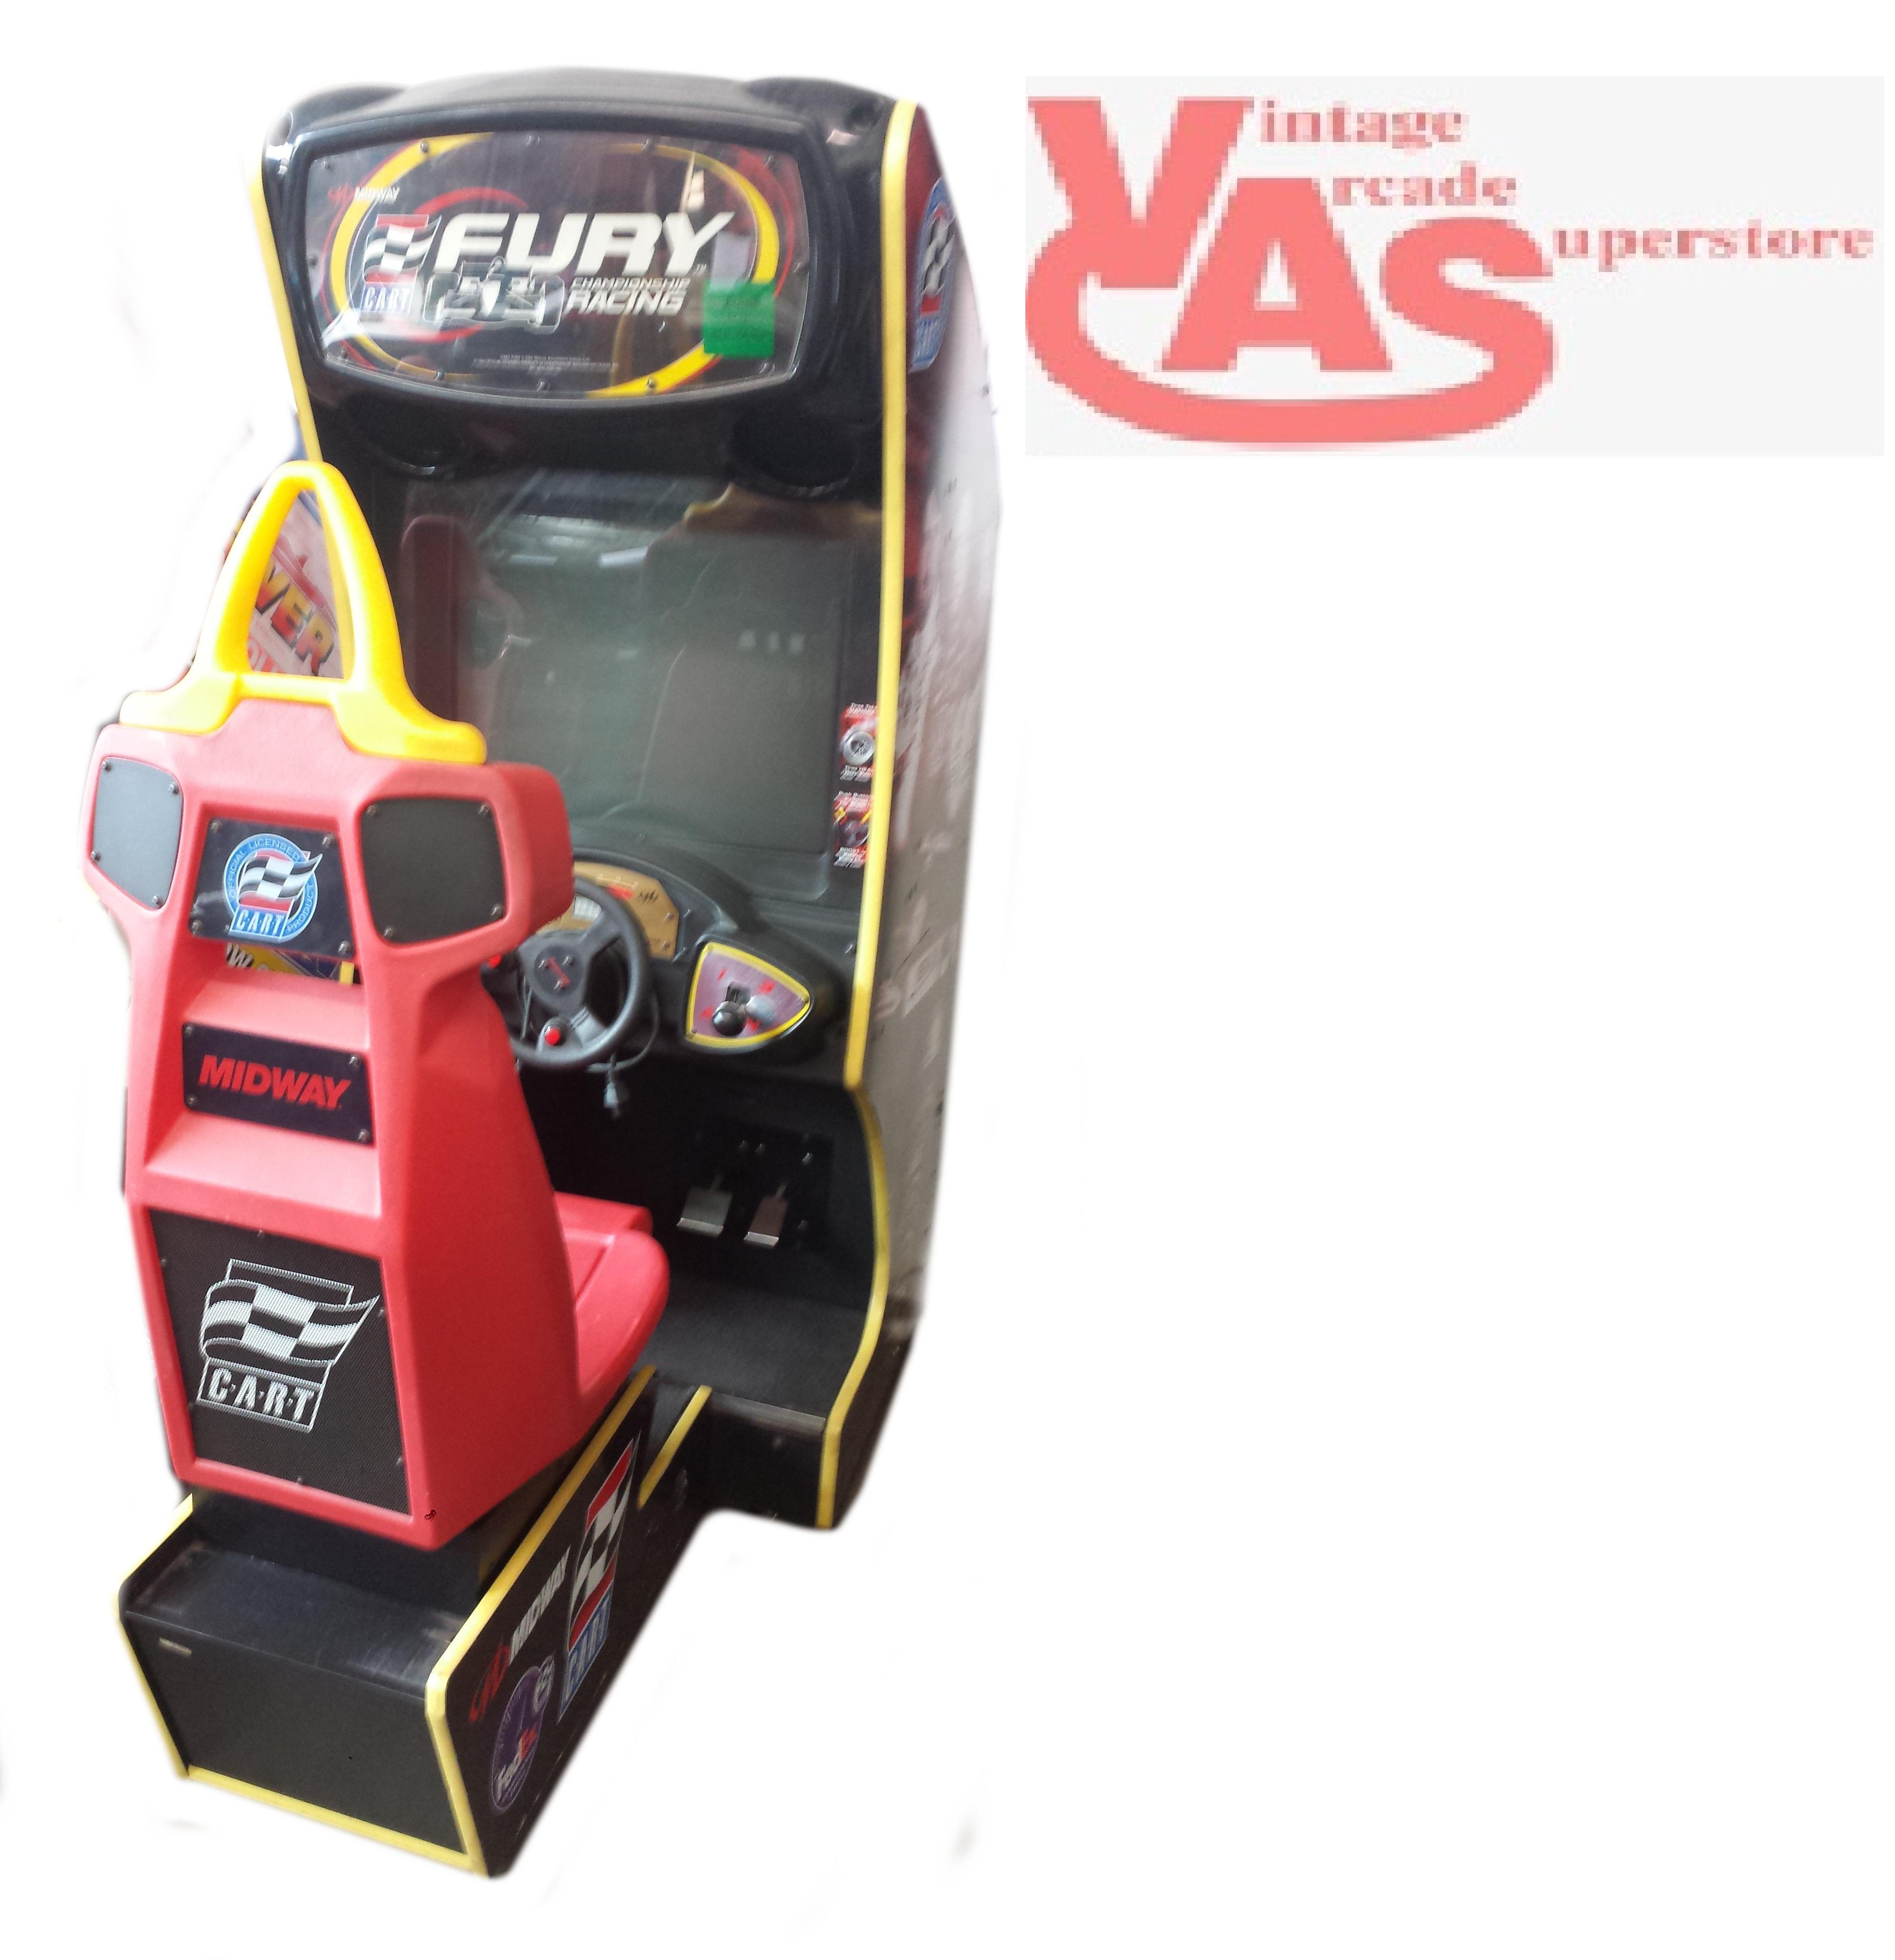 cart fury arcade game for sale vintage arcade superstore